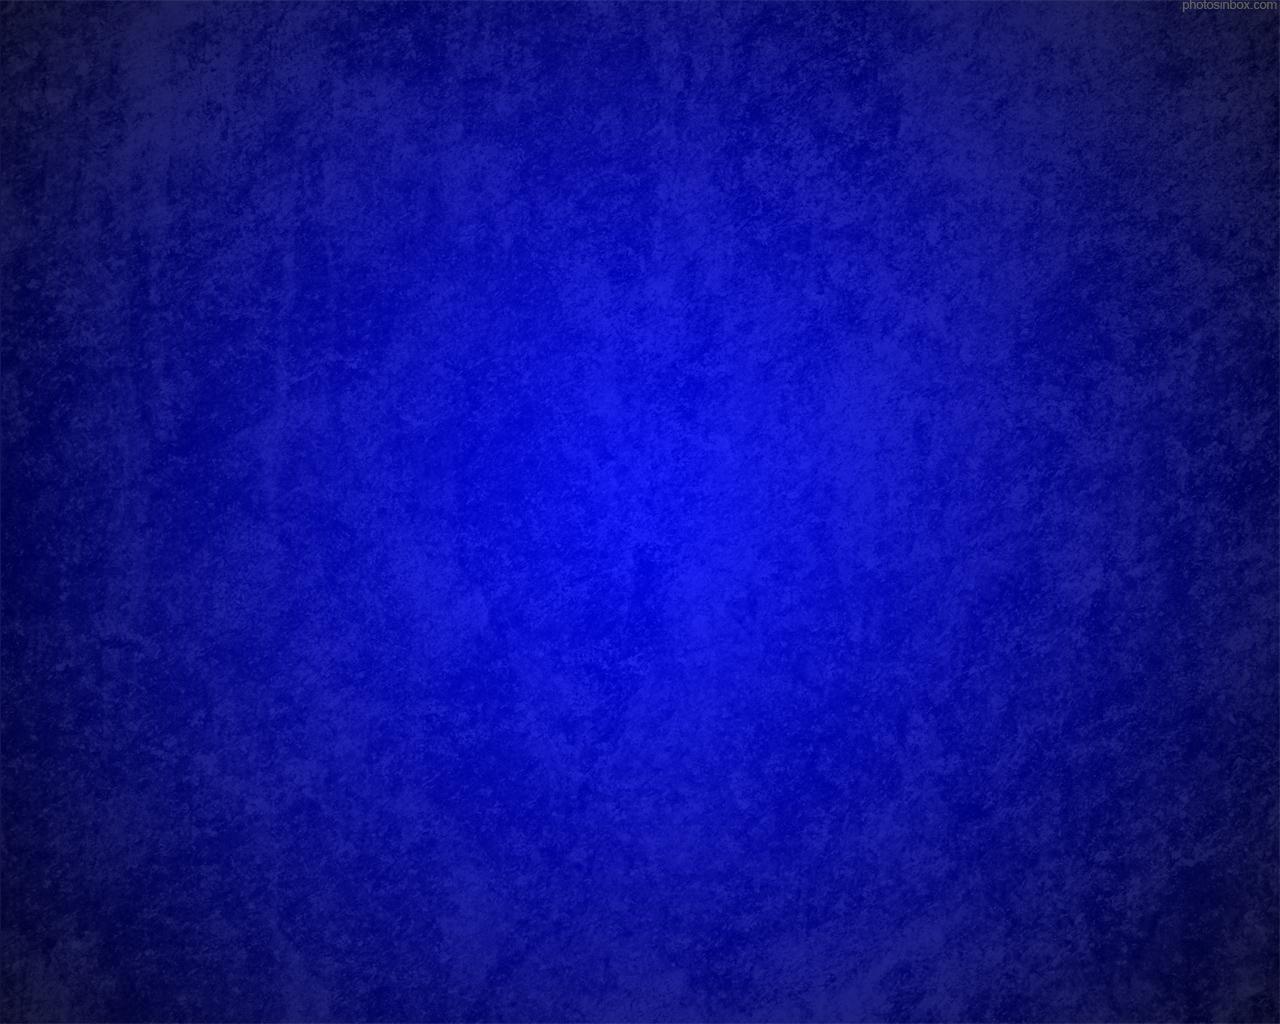 grunge blue background true word of yeshua